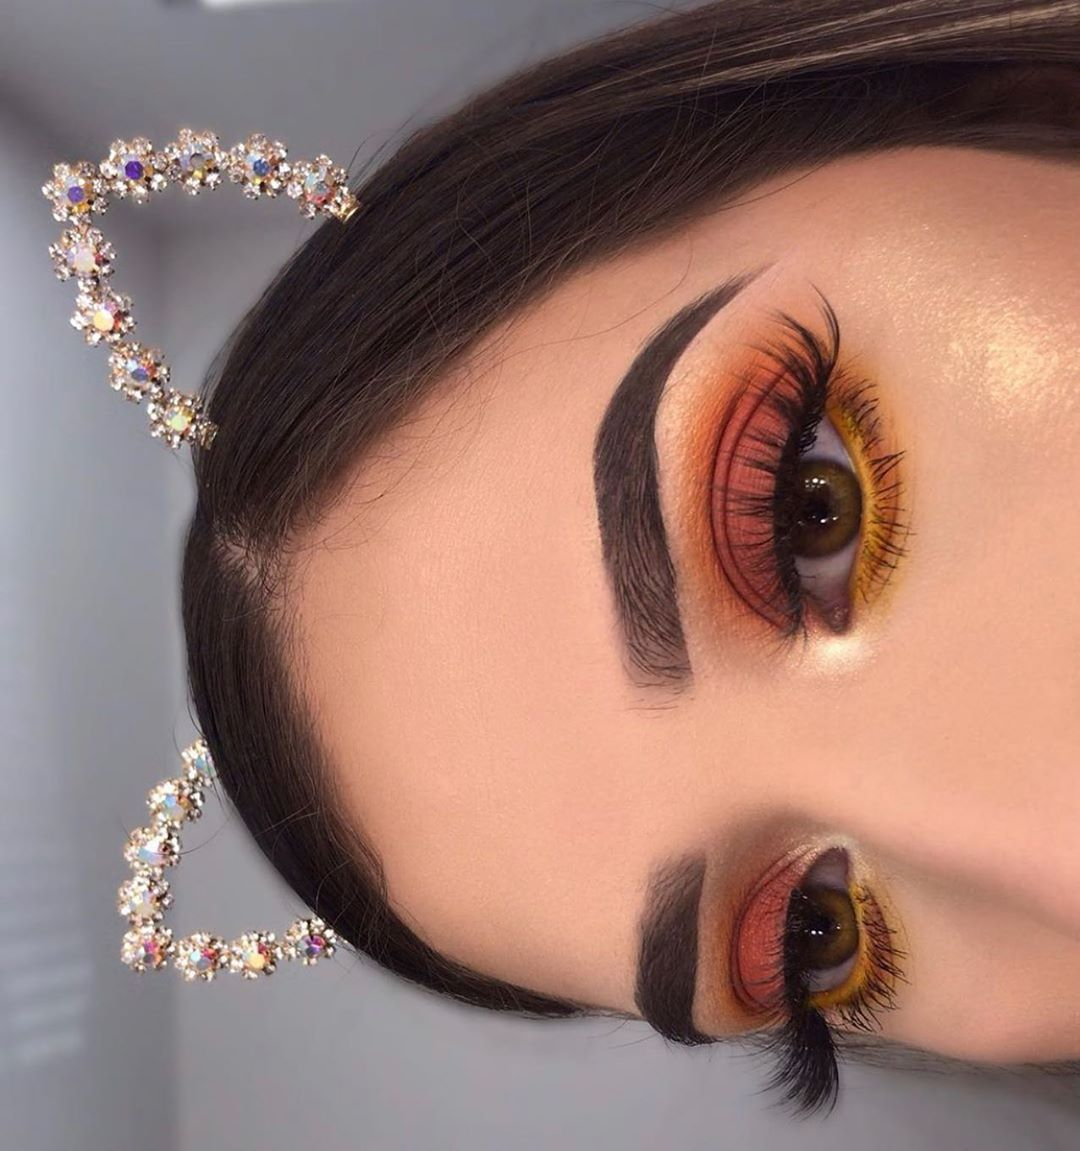 𝐆𝐋𝐀𝐌 𝐌𝐀𝐊𝐄𝐔𝐏 & 𝐓𝐈𝐏𝐒 on Instagram in 2020 Eye makeup, Glam